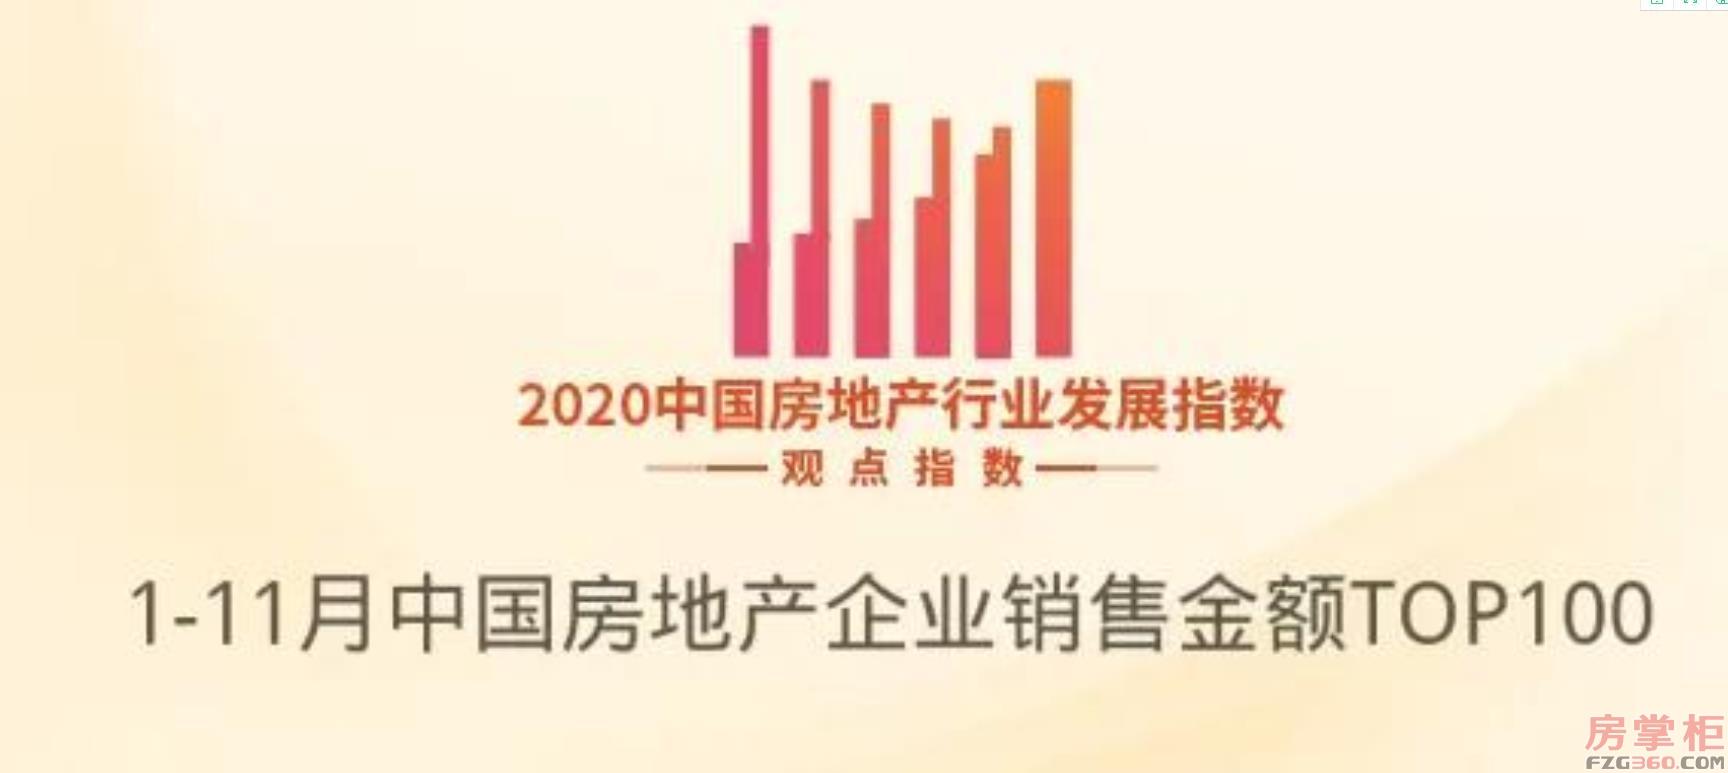 2020年1-11月